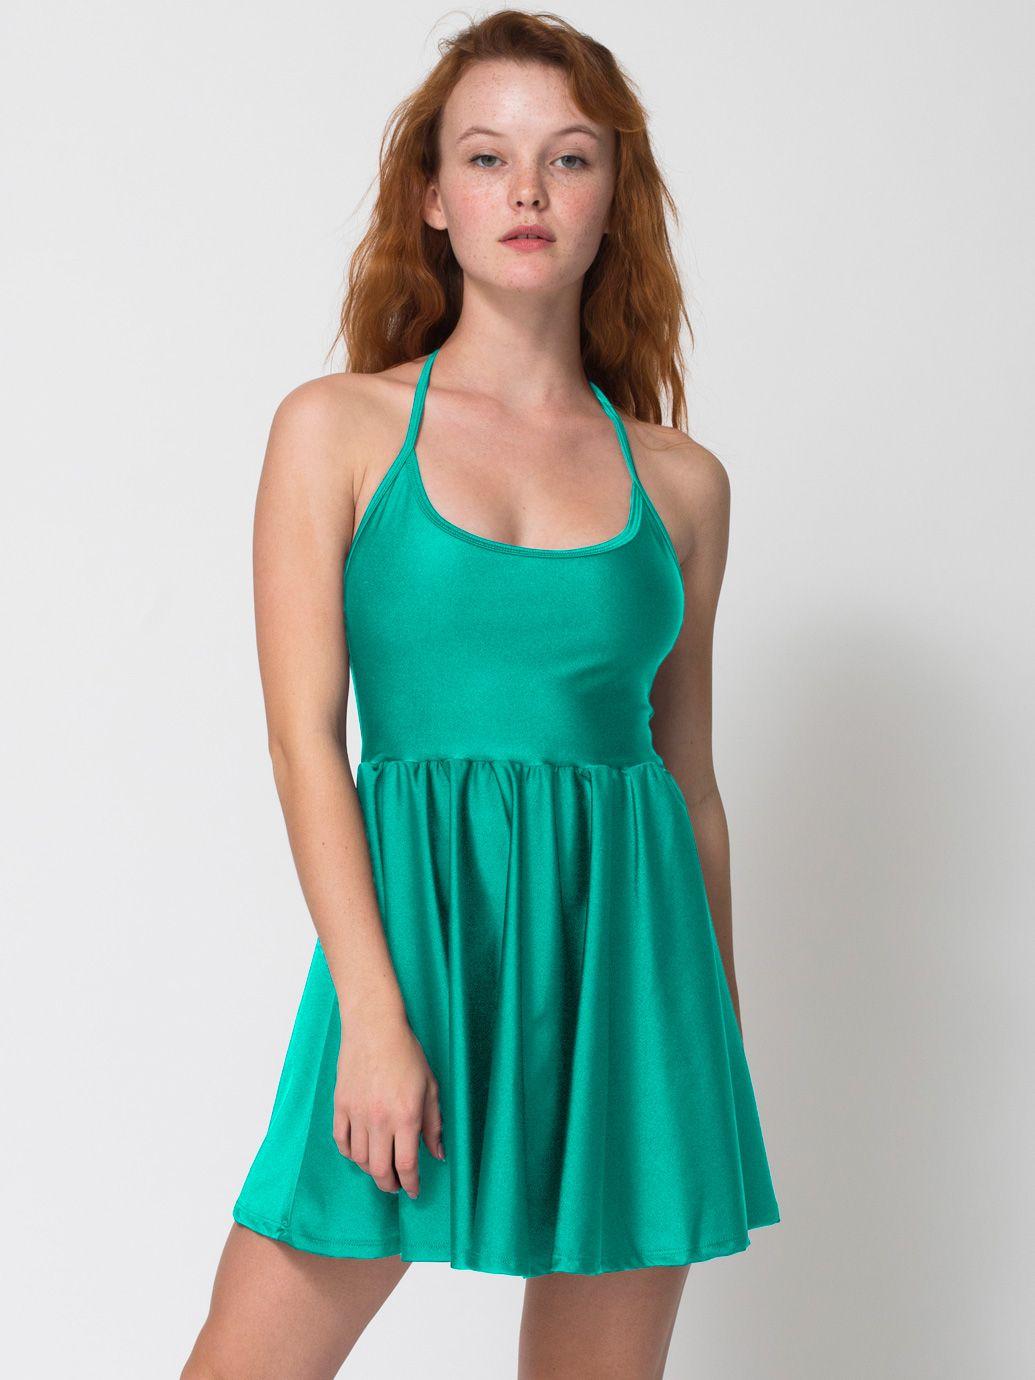 Nylon Tricot Figure Skater Dress | Mini Sleeveless | Women\'s Dresses ...